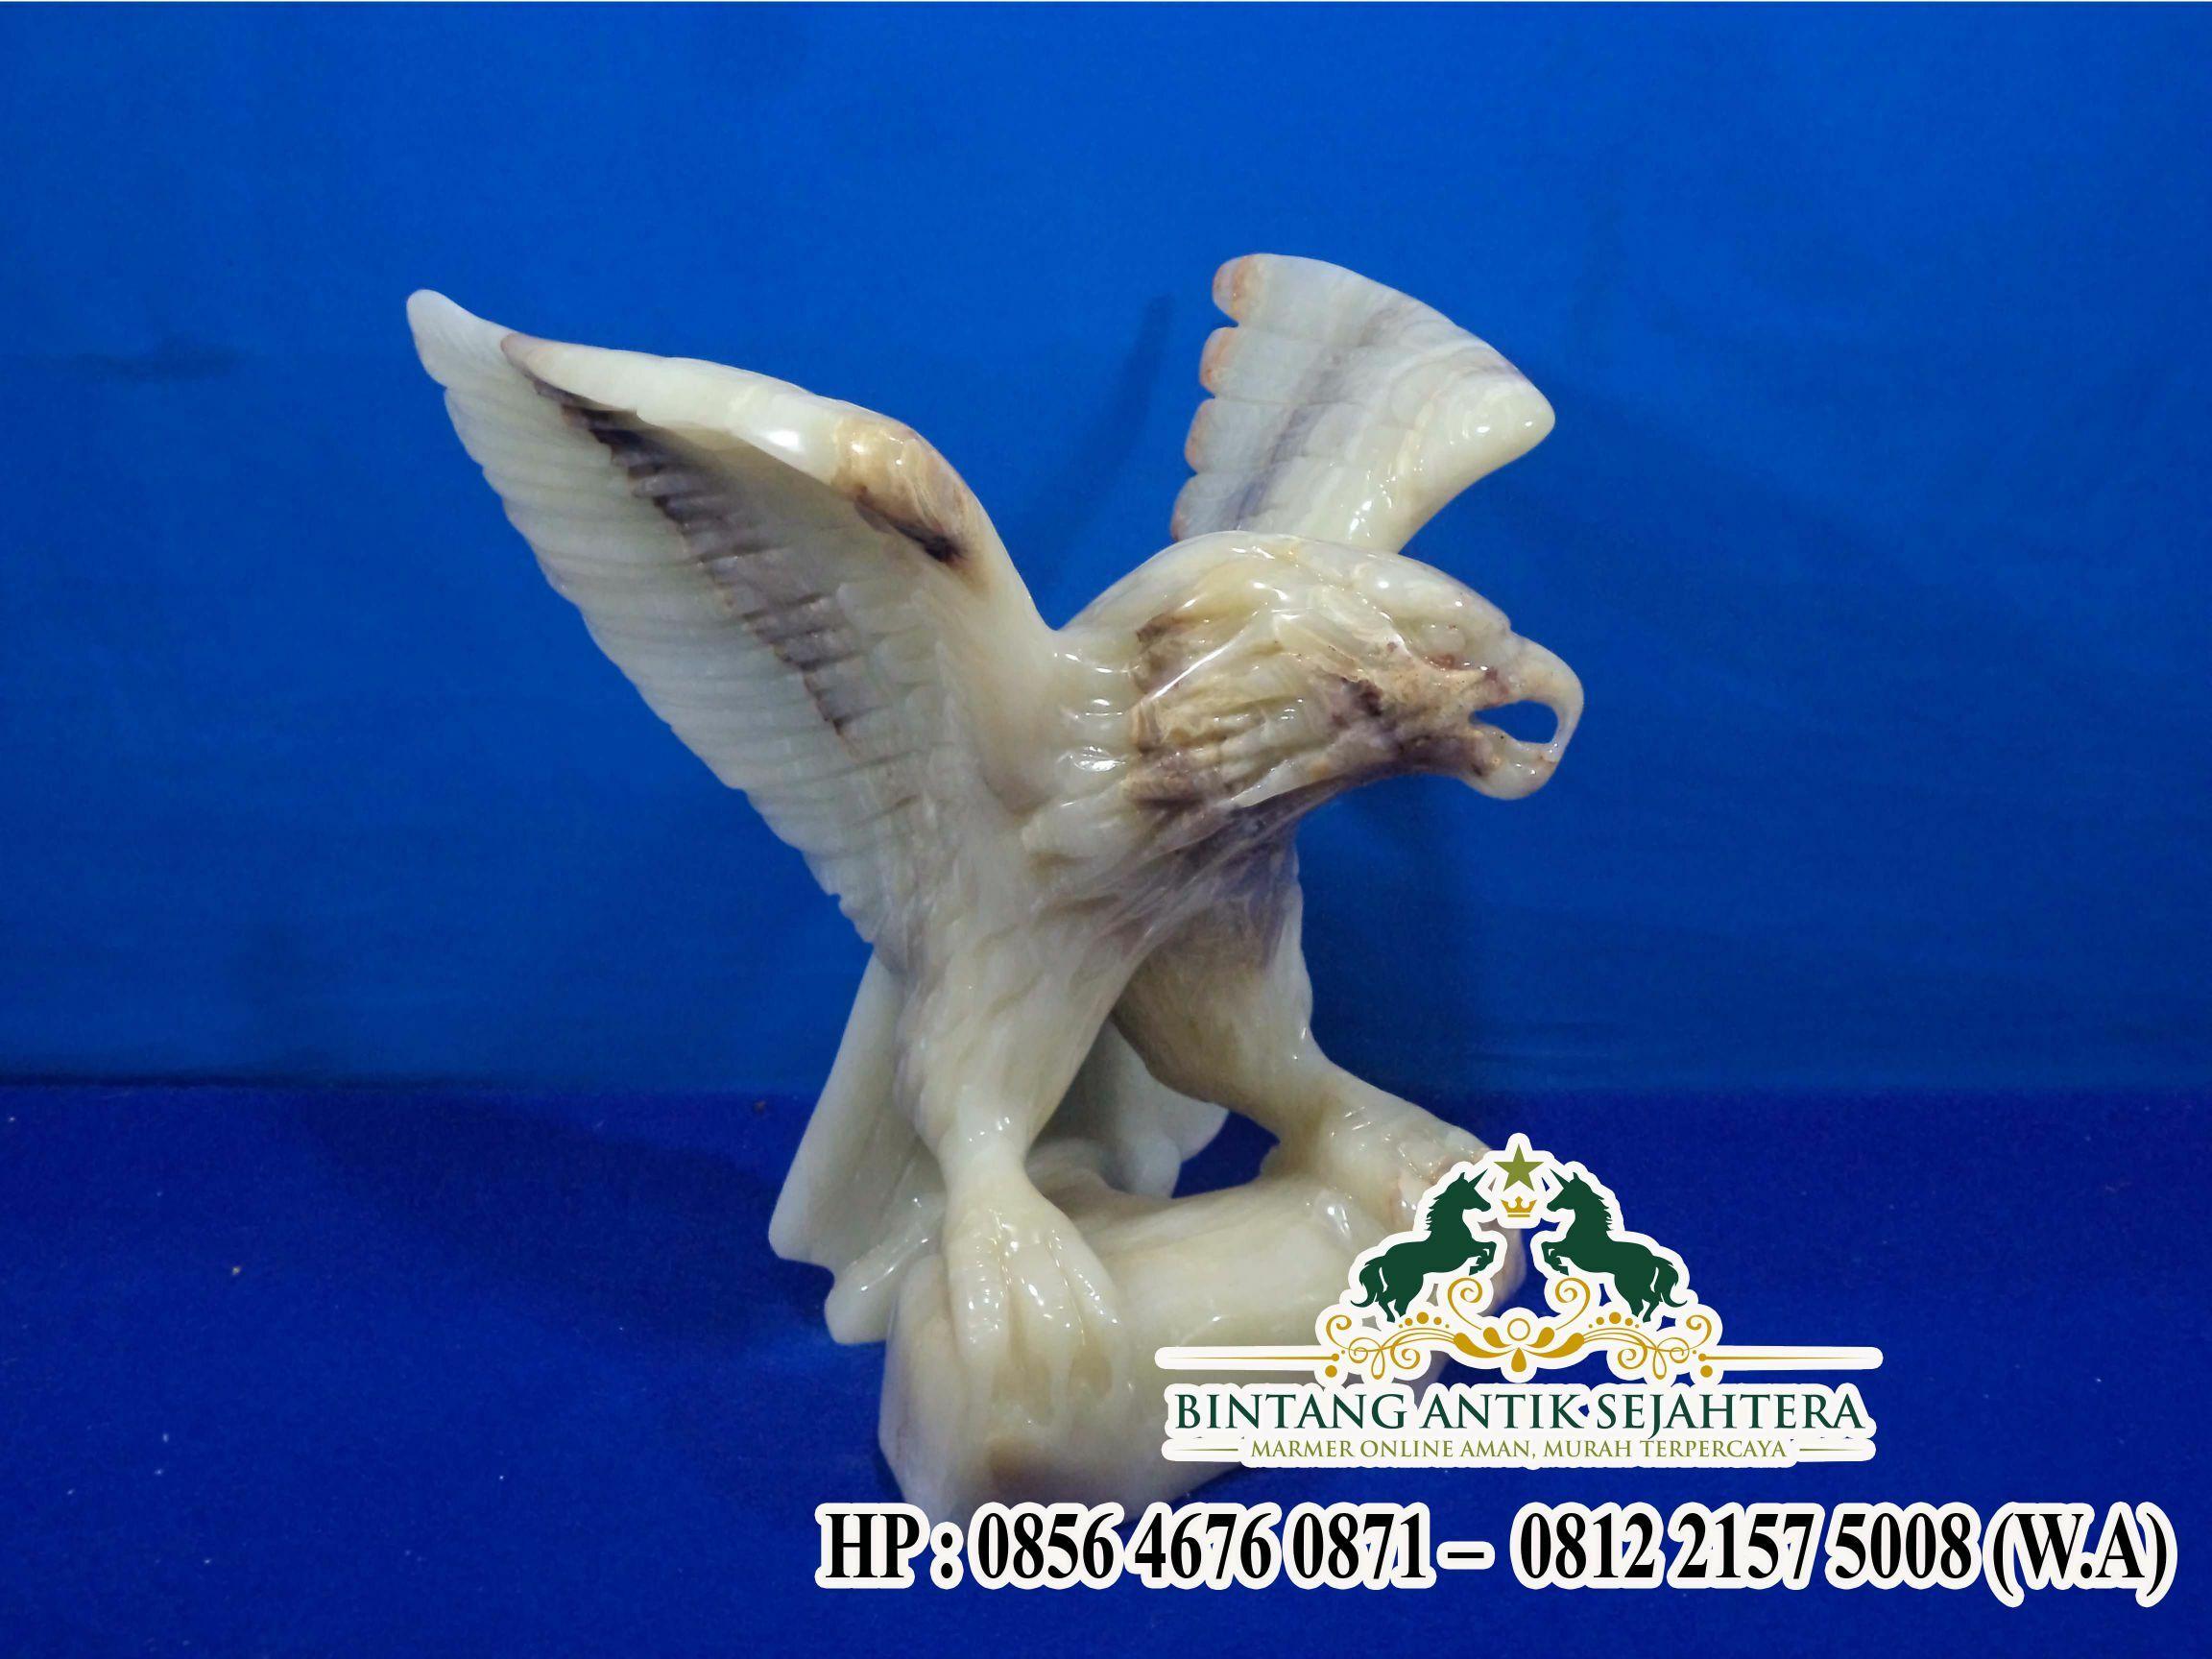 Jual Patung Burung Elang Onyx